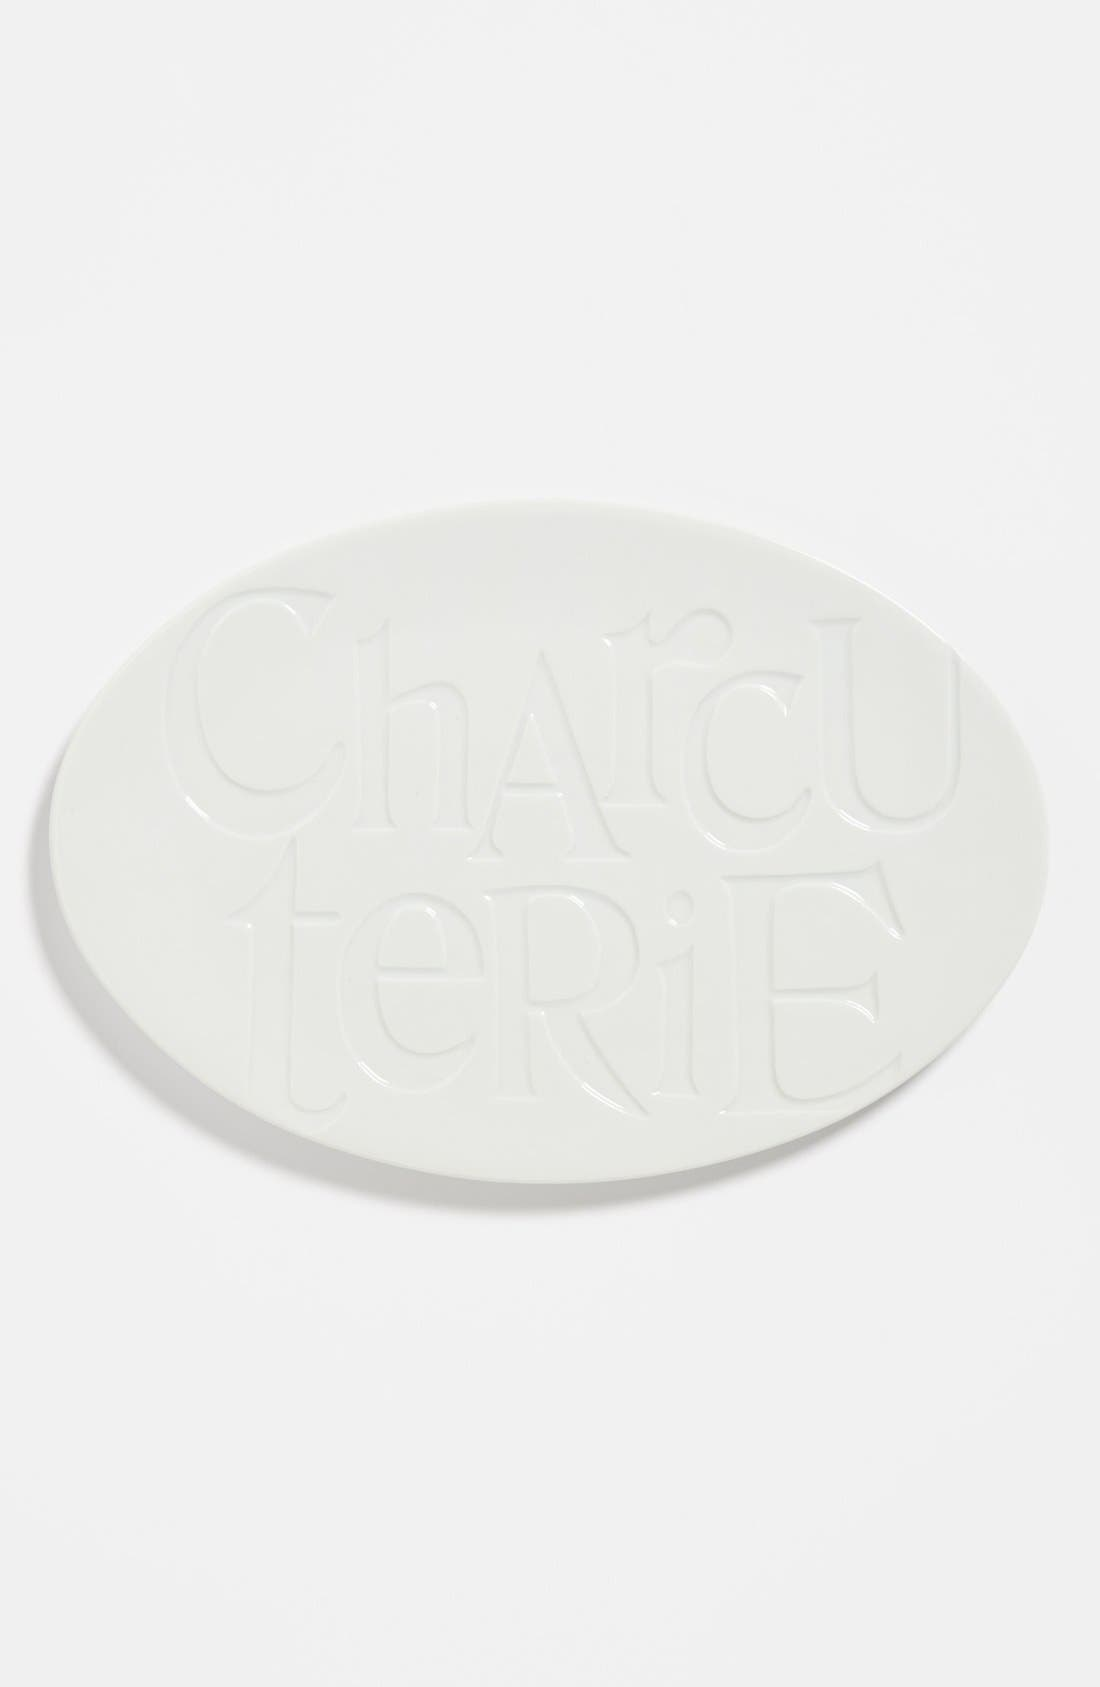 Main Image - Rosanna 'Savour - Charcuterie' Porcelain Tray